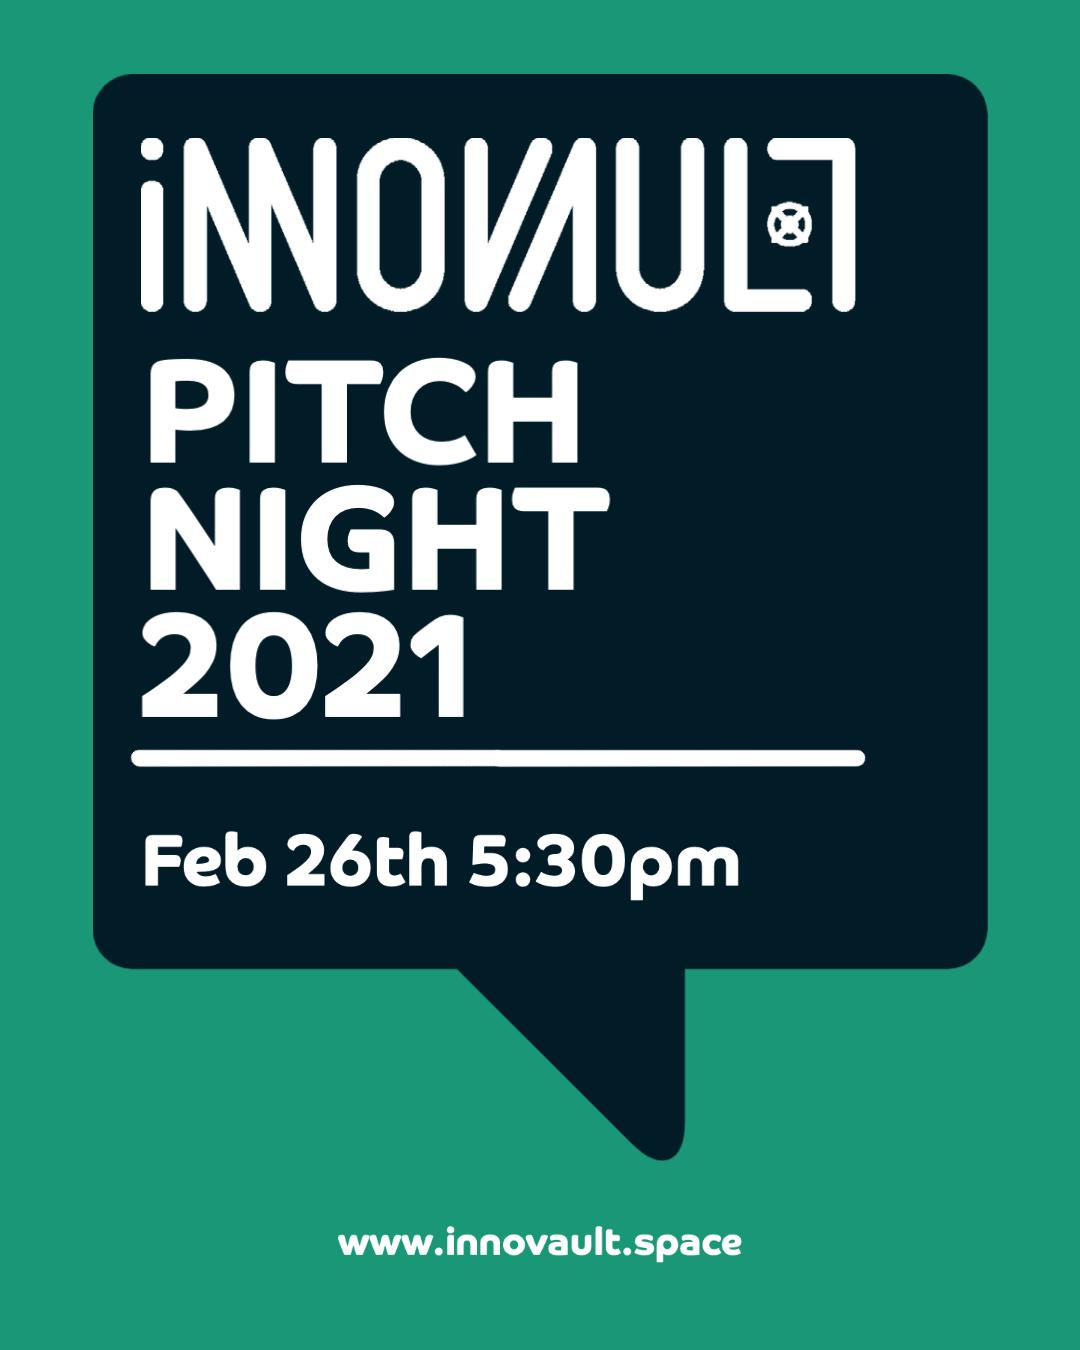 2021 Pitch Night Graphic